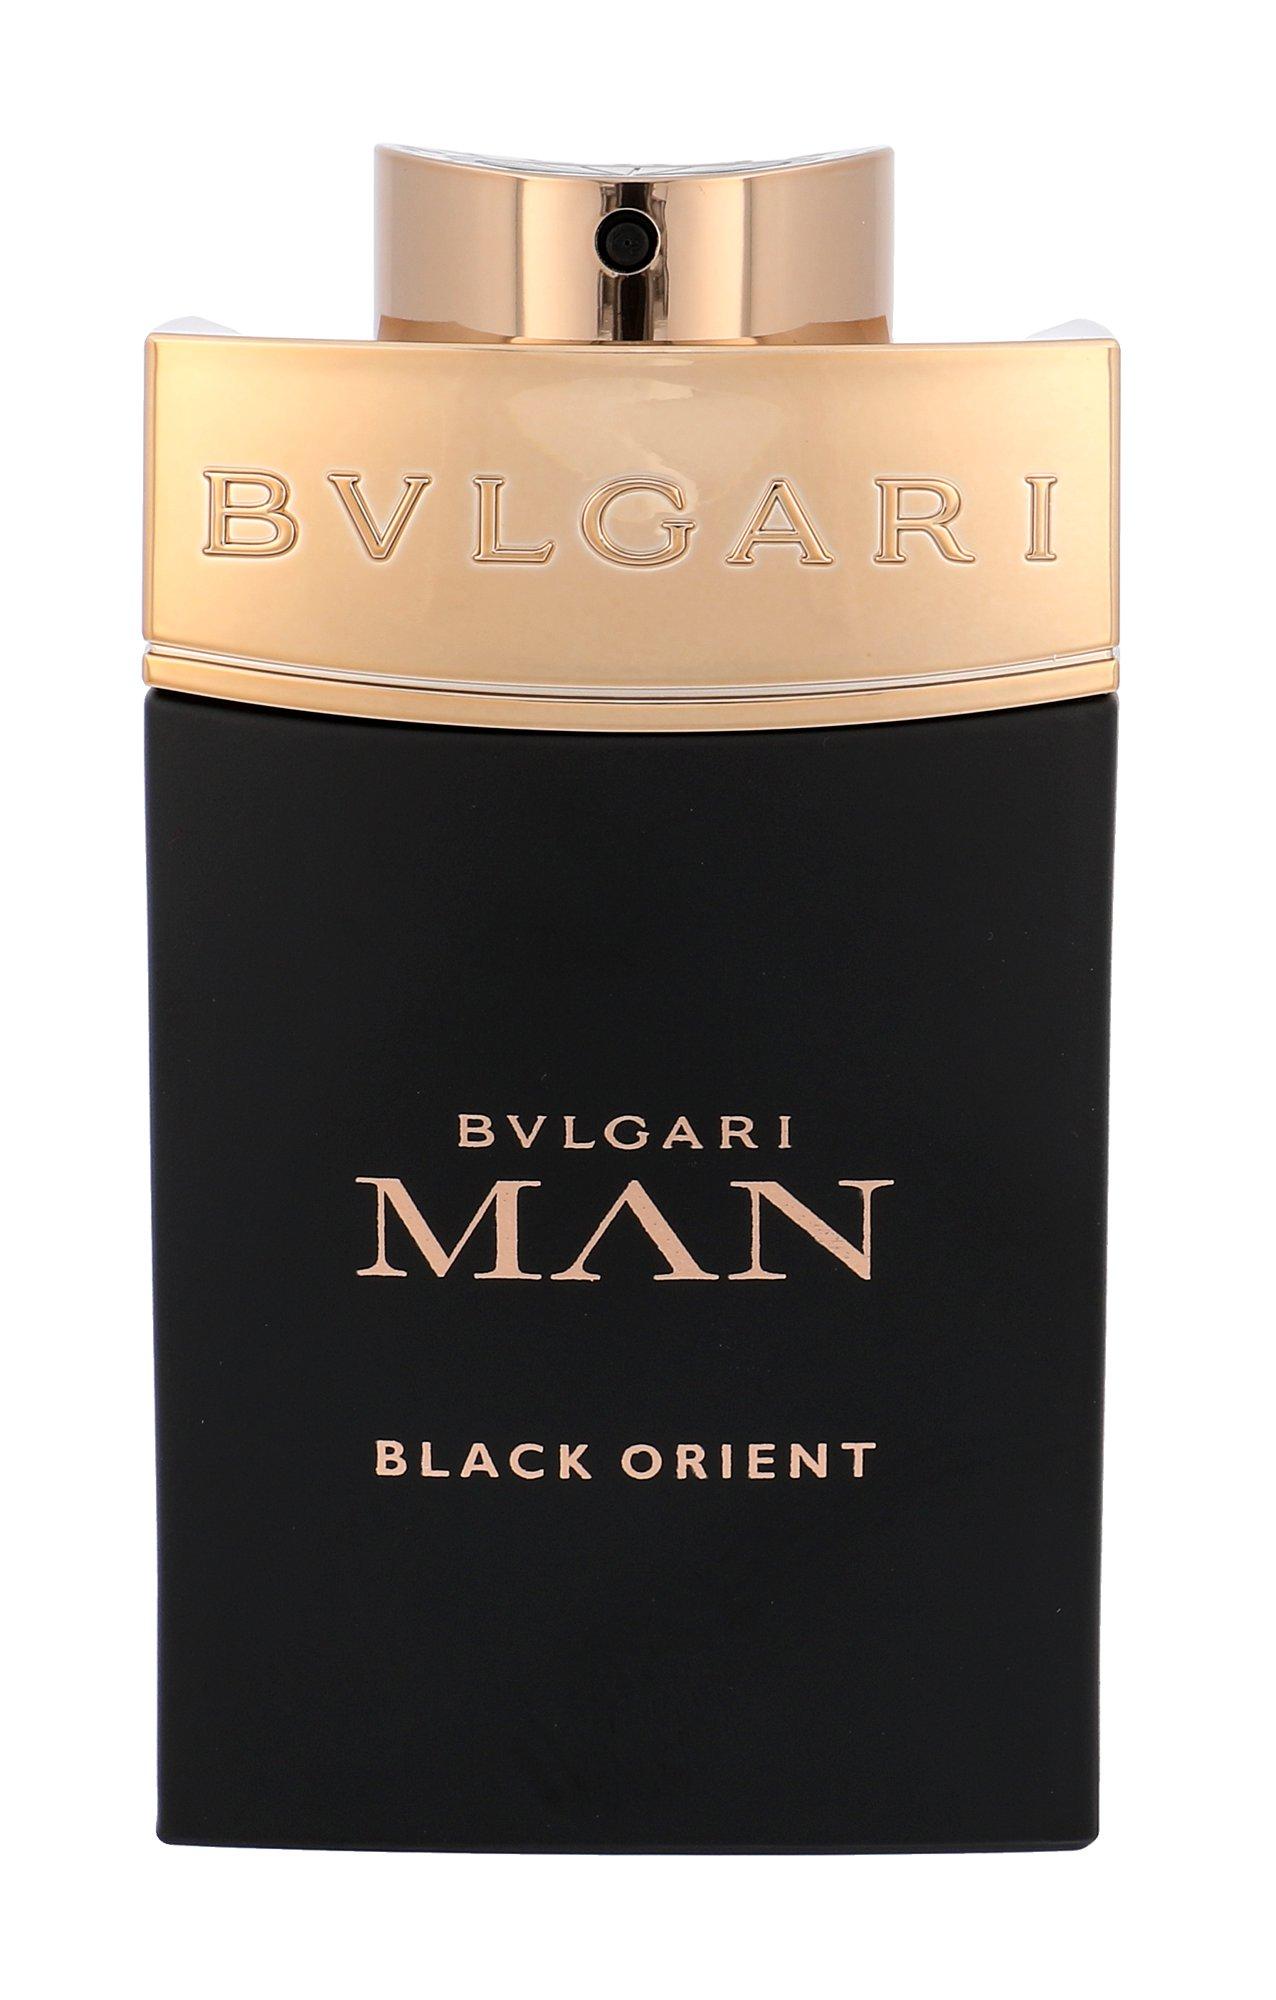 Bvlgari Man Black Orient Parfém tester 100 ml M